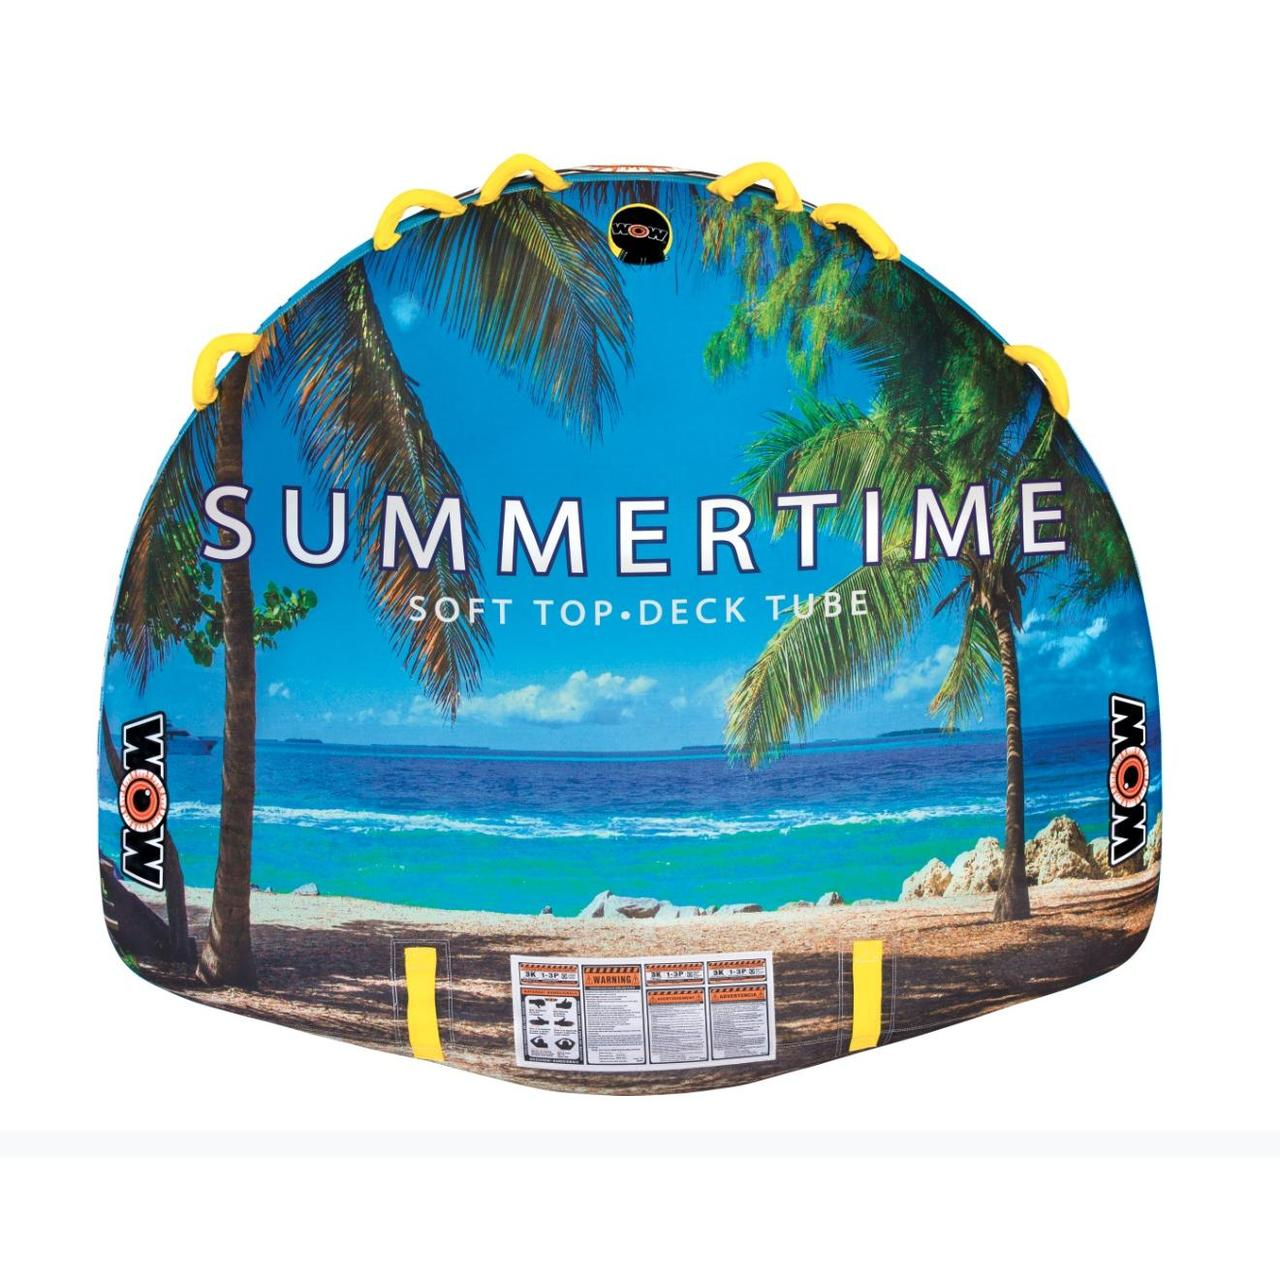 Буксируемый баллон (Плюшка) Summertime 3P Towable WOW 19-1030